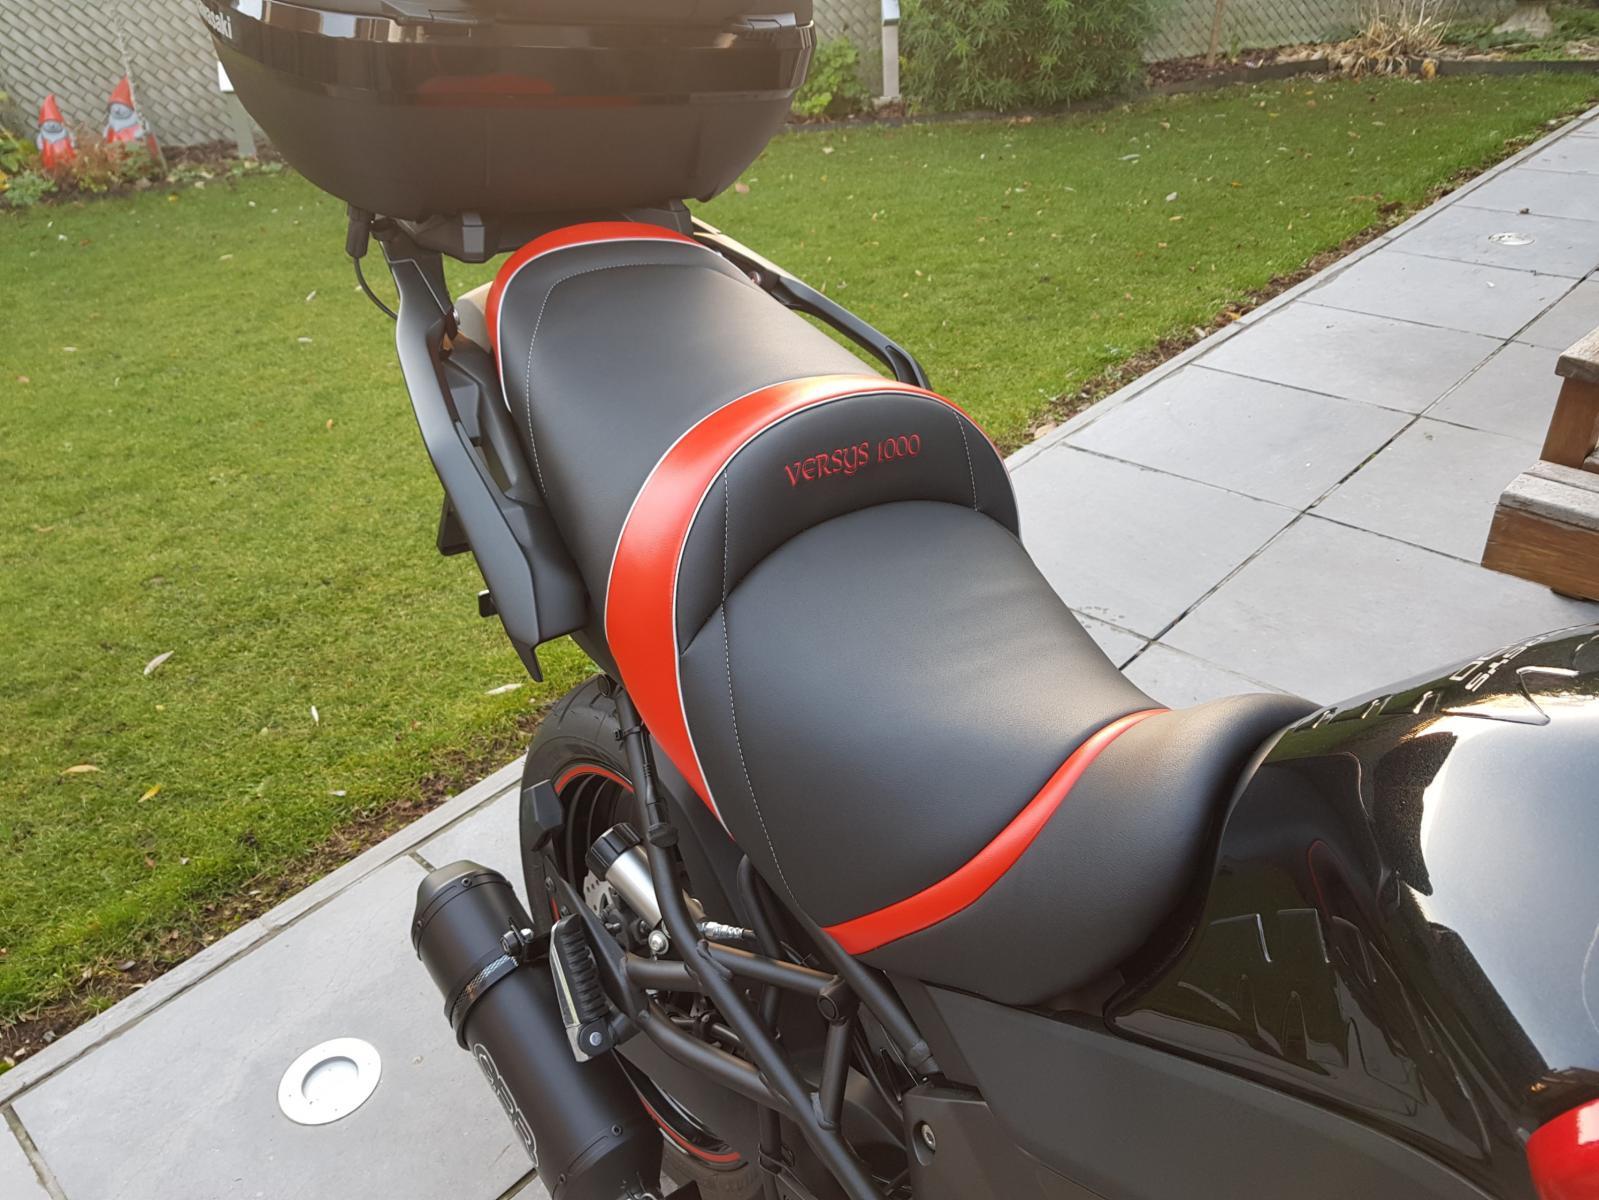 Kawasaki Versys 1000 Seat Height